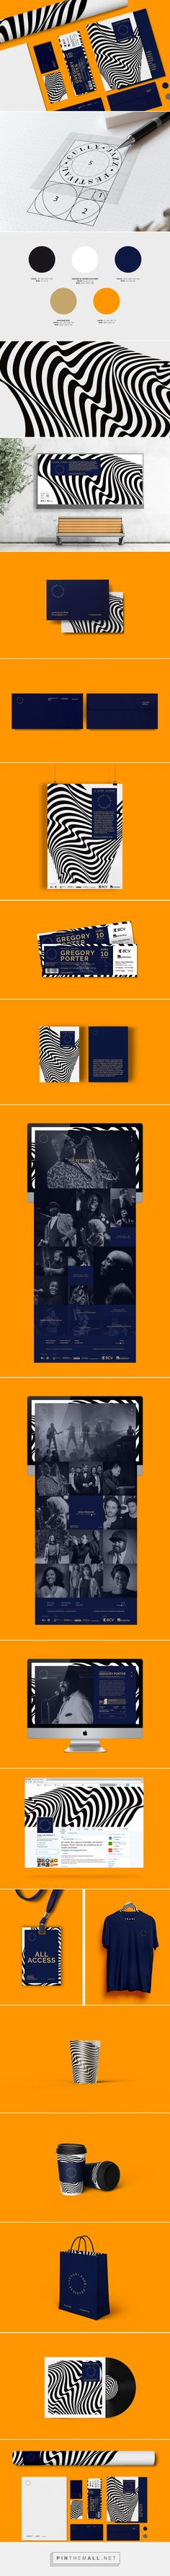 Cully Jazz Festival | Branding on Behance - created via https://pinthemall.net